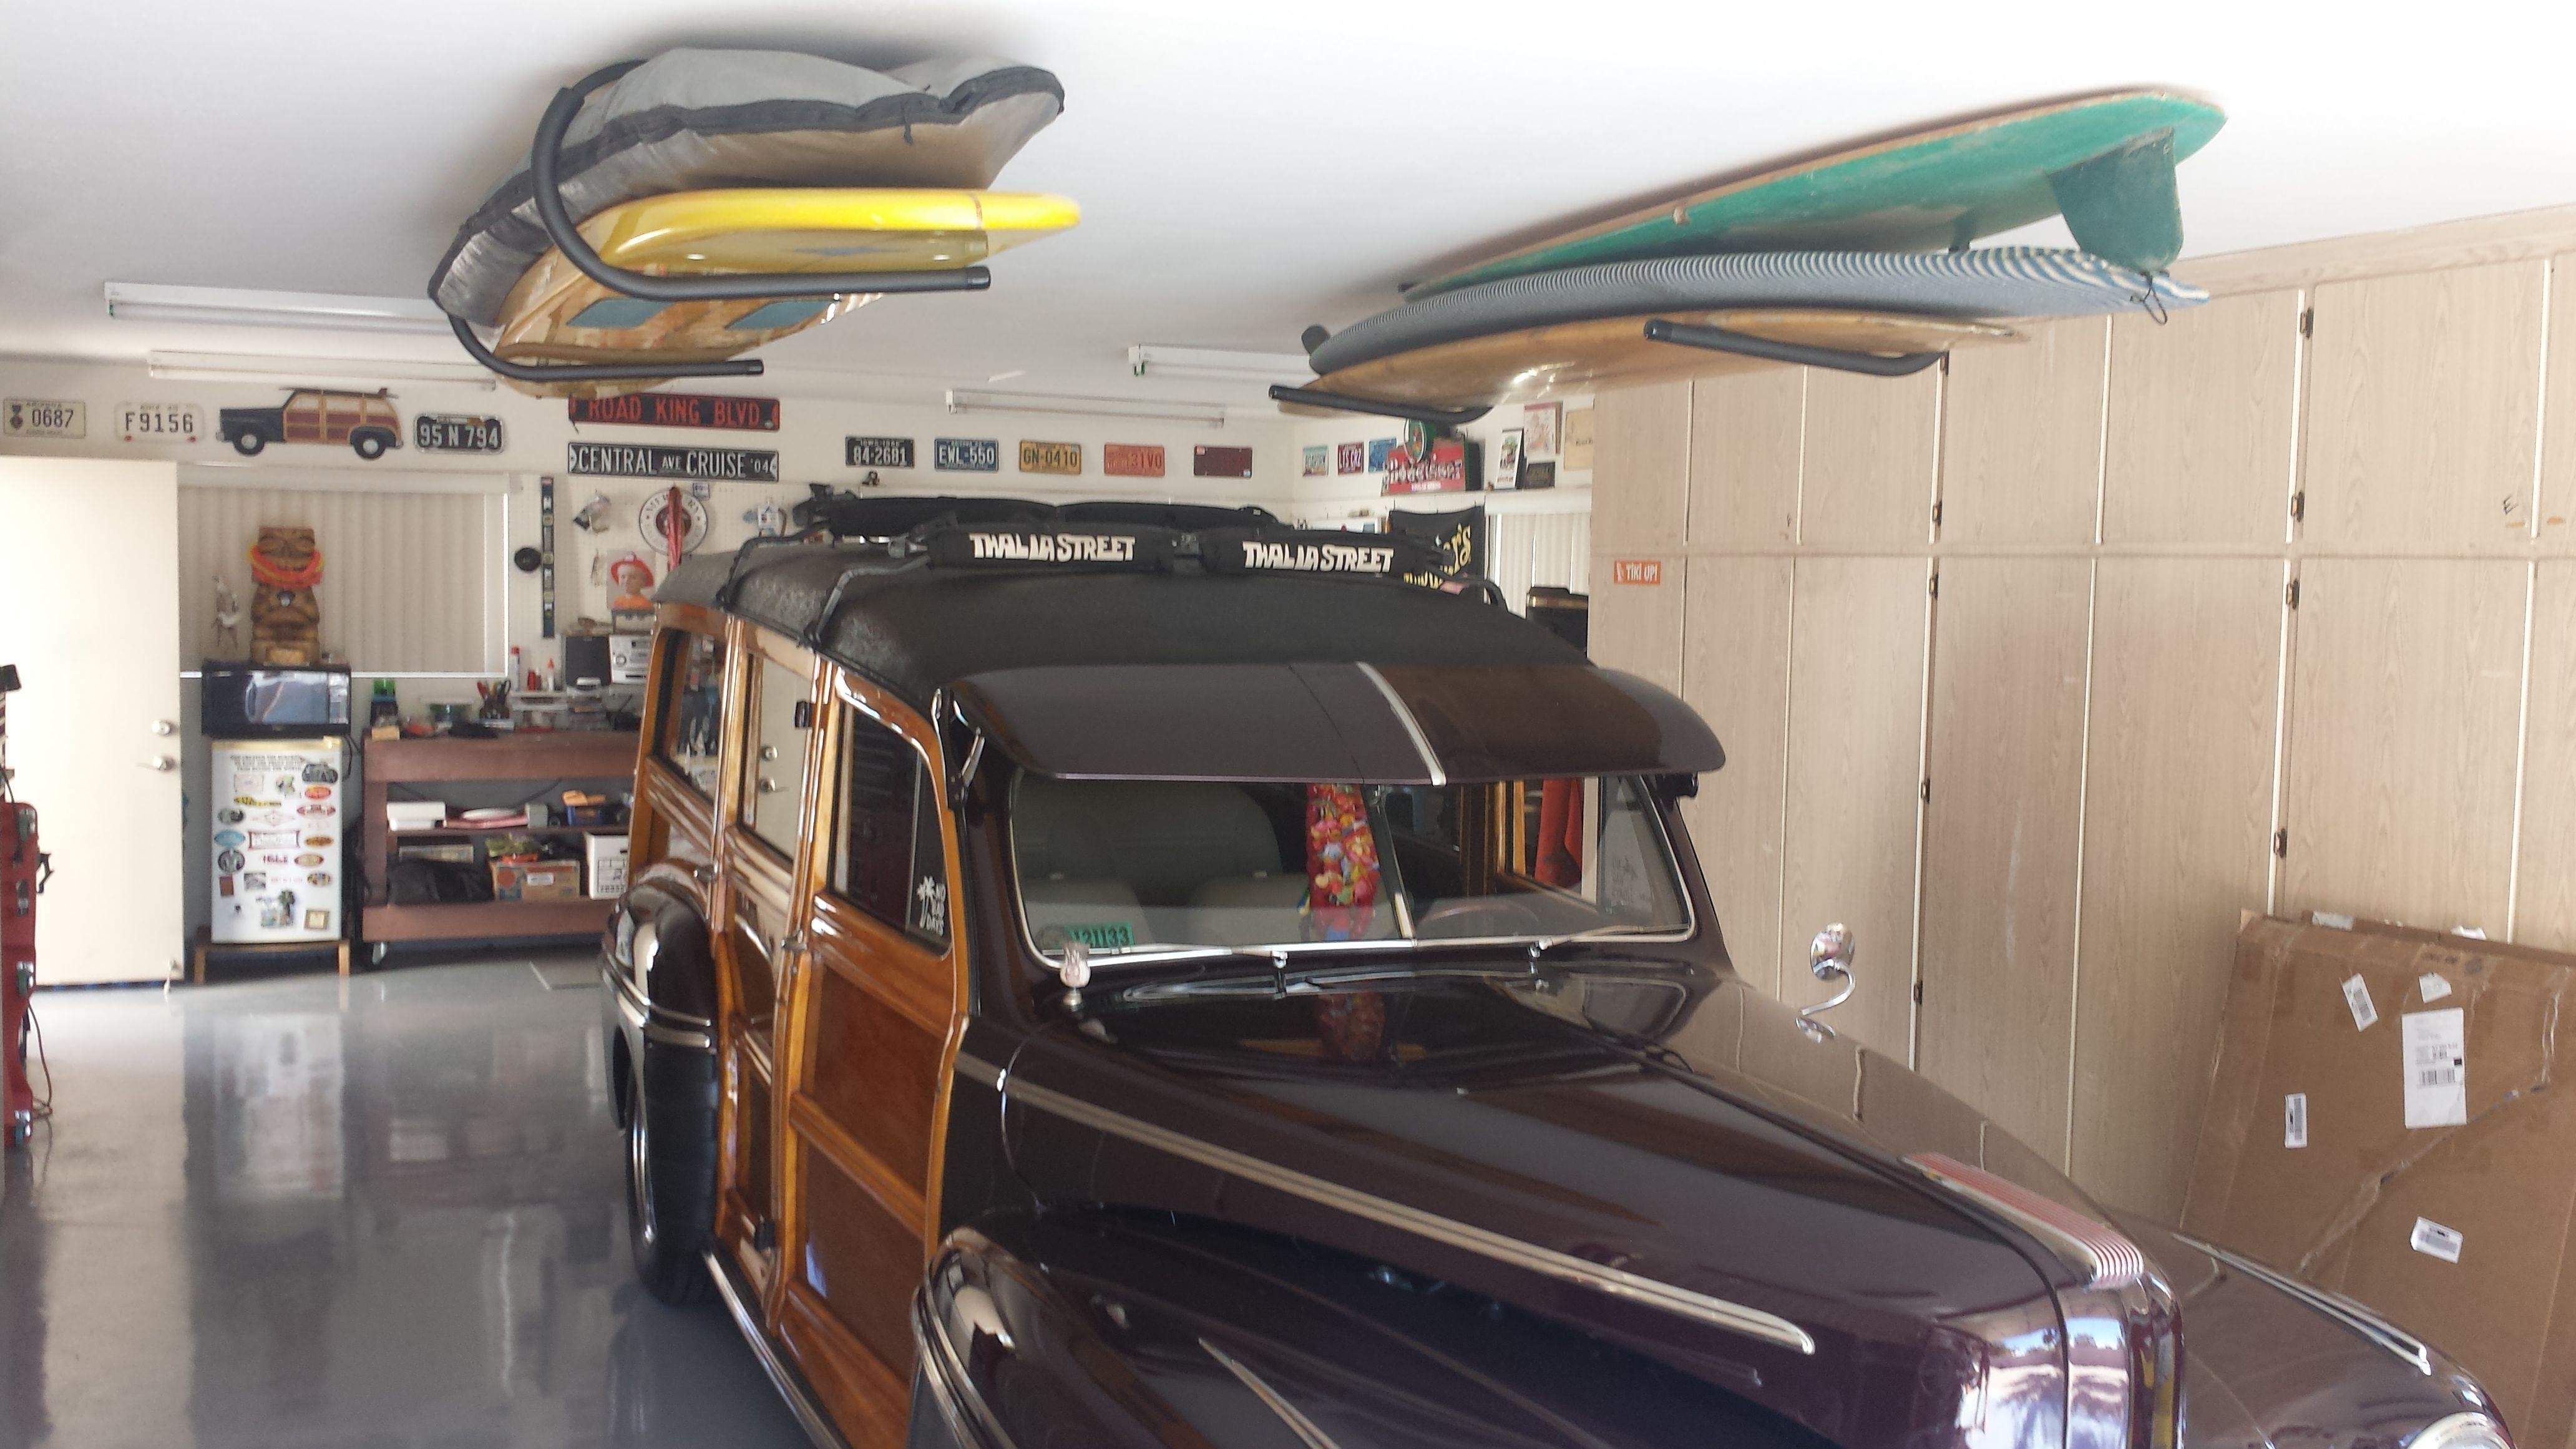 A Retro Garage With Ceiling Storage For Retro Surfboards #Surfboardstorage